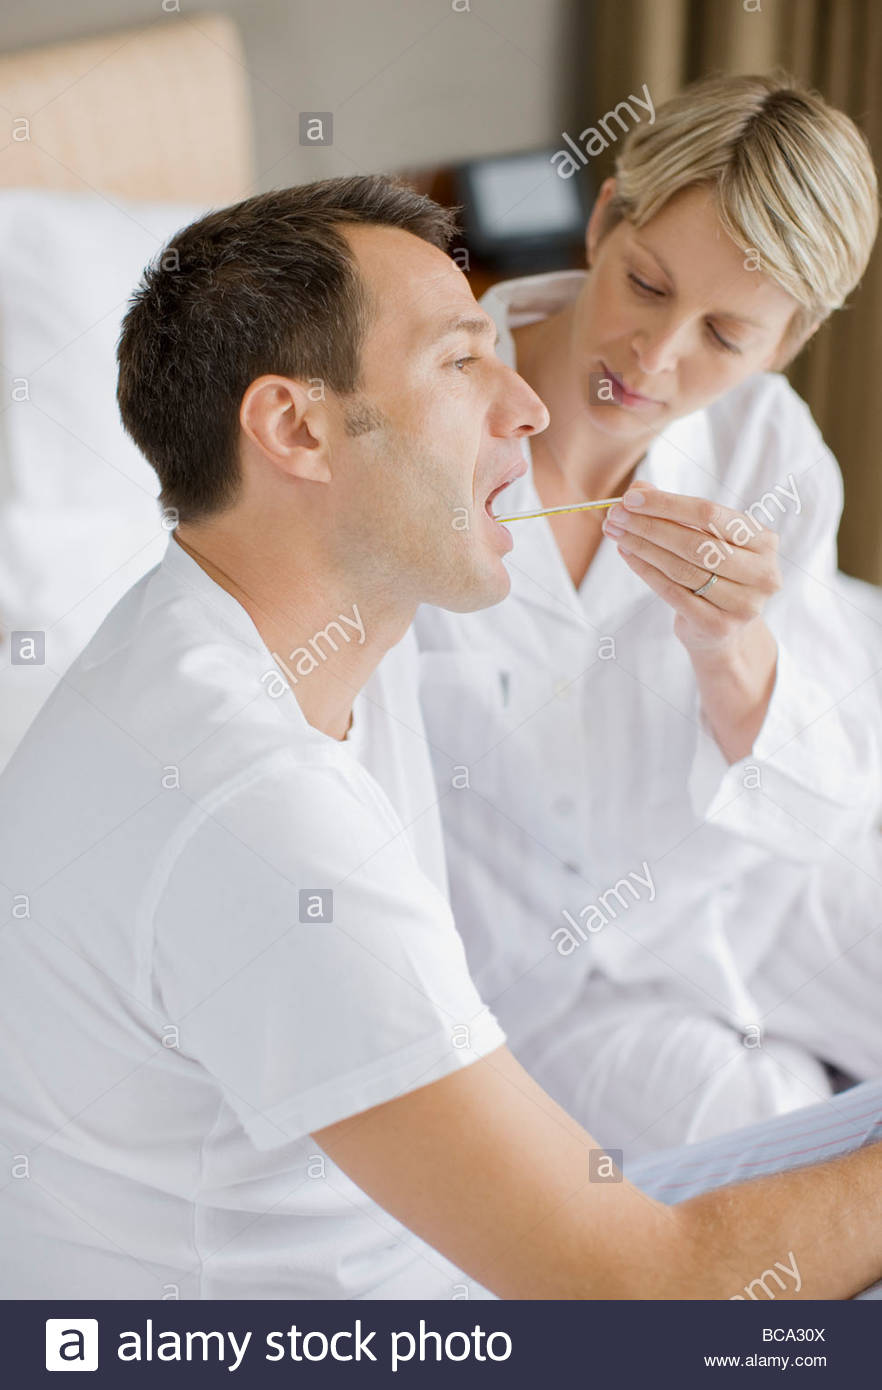 Frau nehmen Mannes Temperatur Stockbild